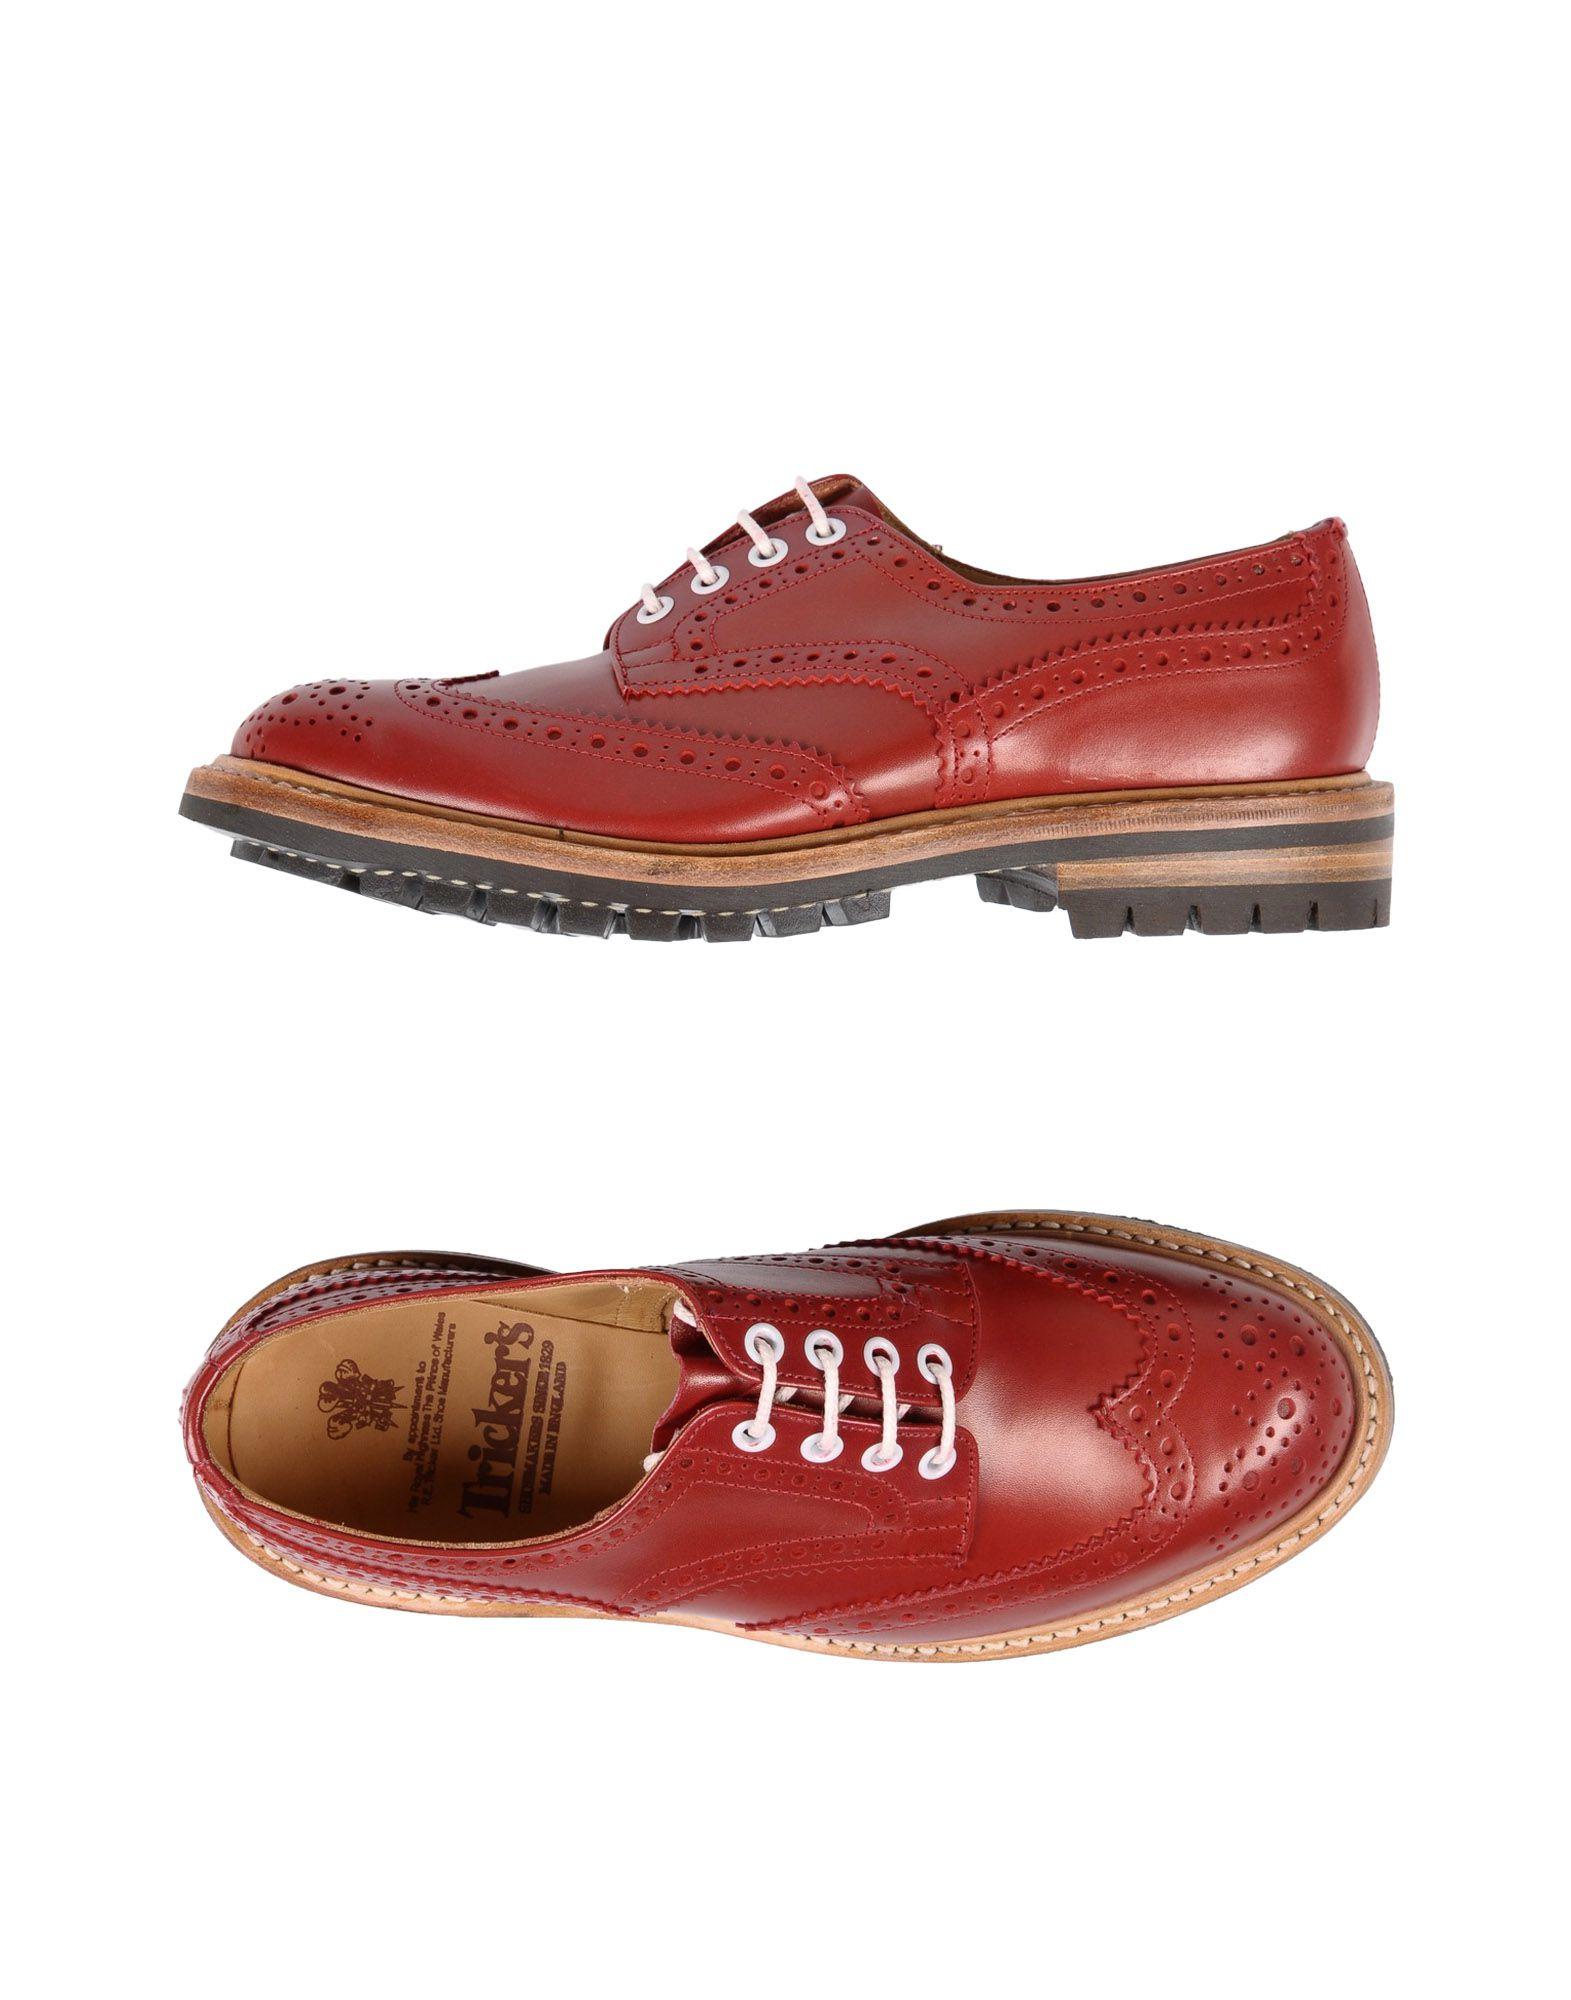 Фото - TRICKER'S Обувь на шнурках обувь на высокой платформе dkny